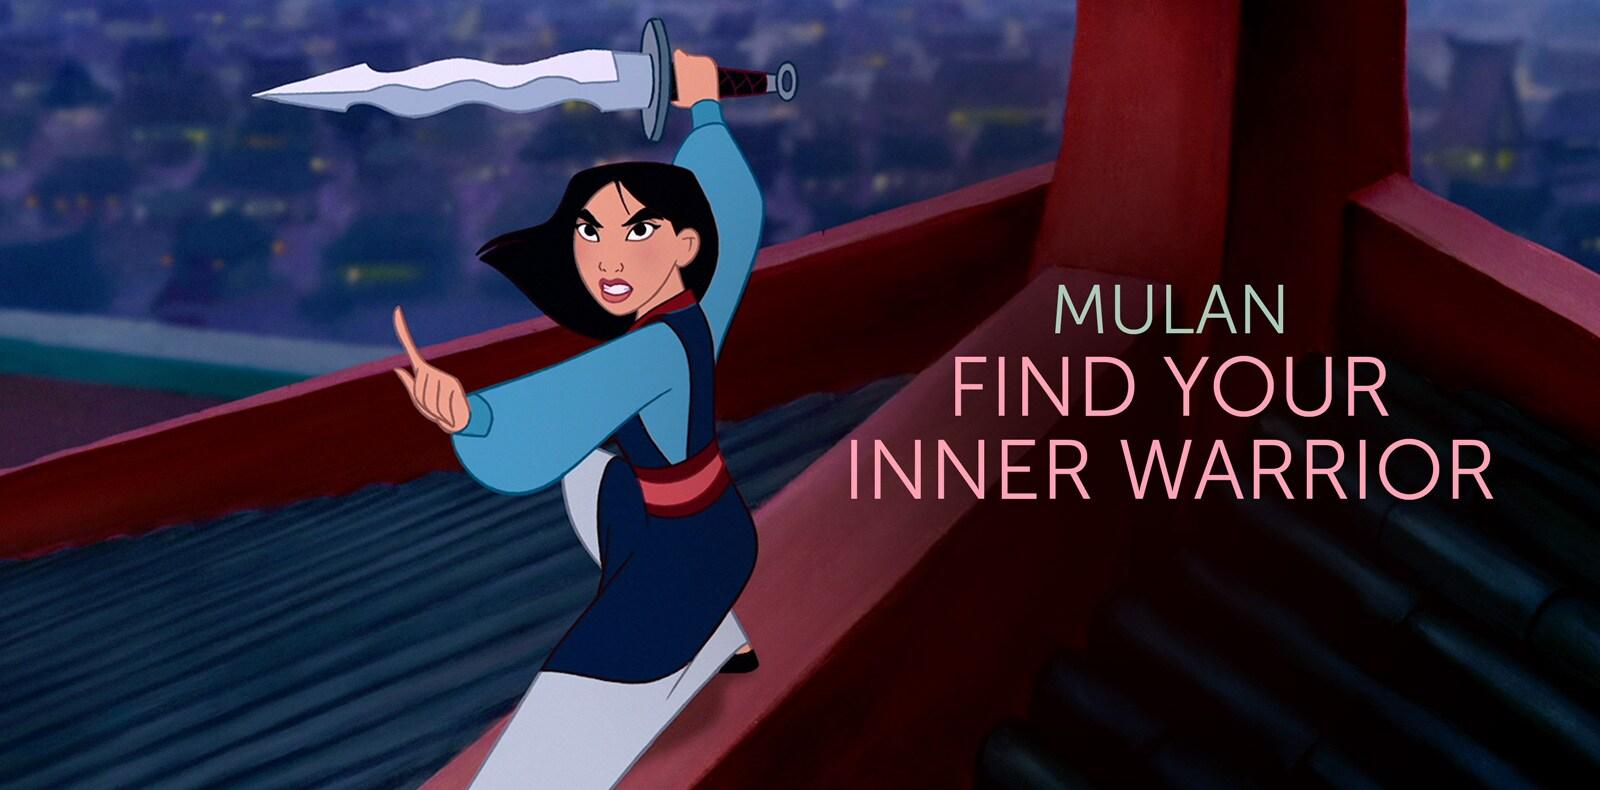 mulan as the woman warrior